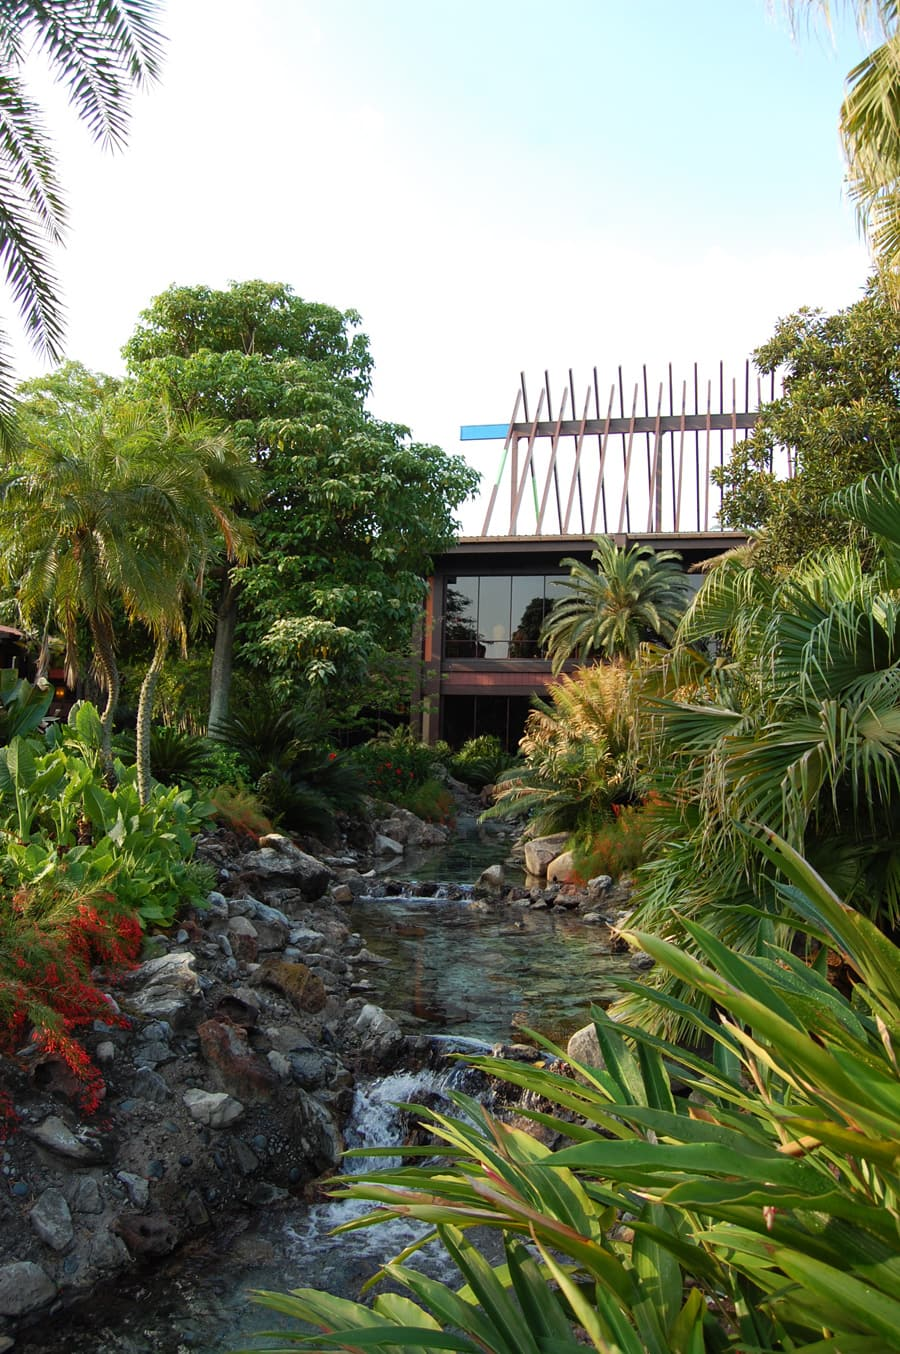 Kukui Nut Tree at Disney's Polynesian Resort